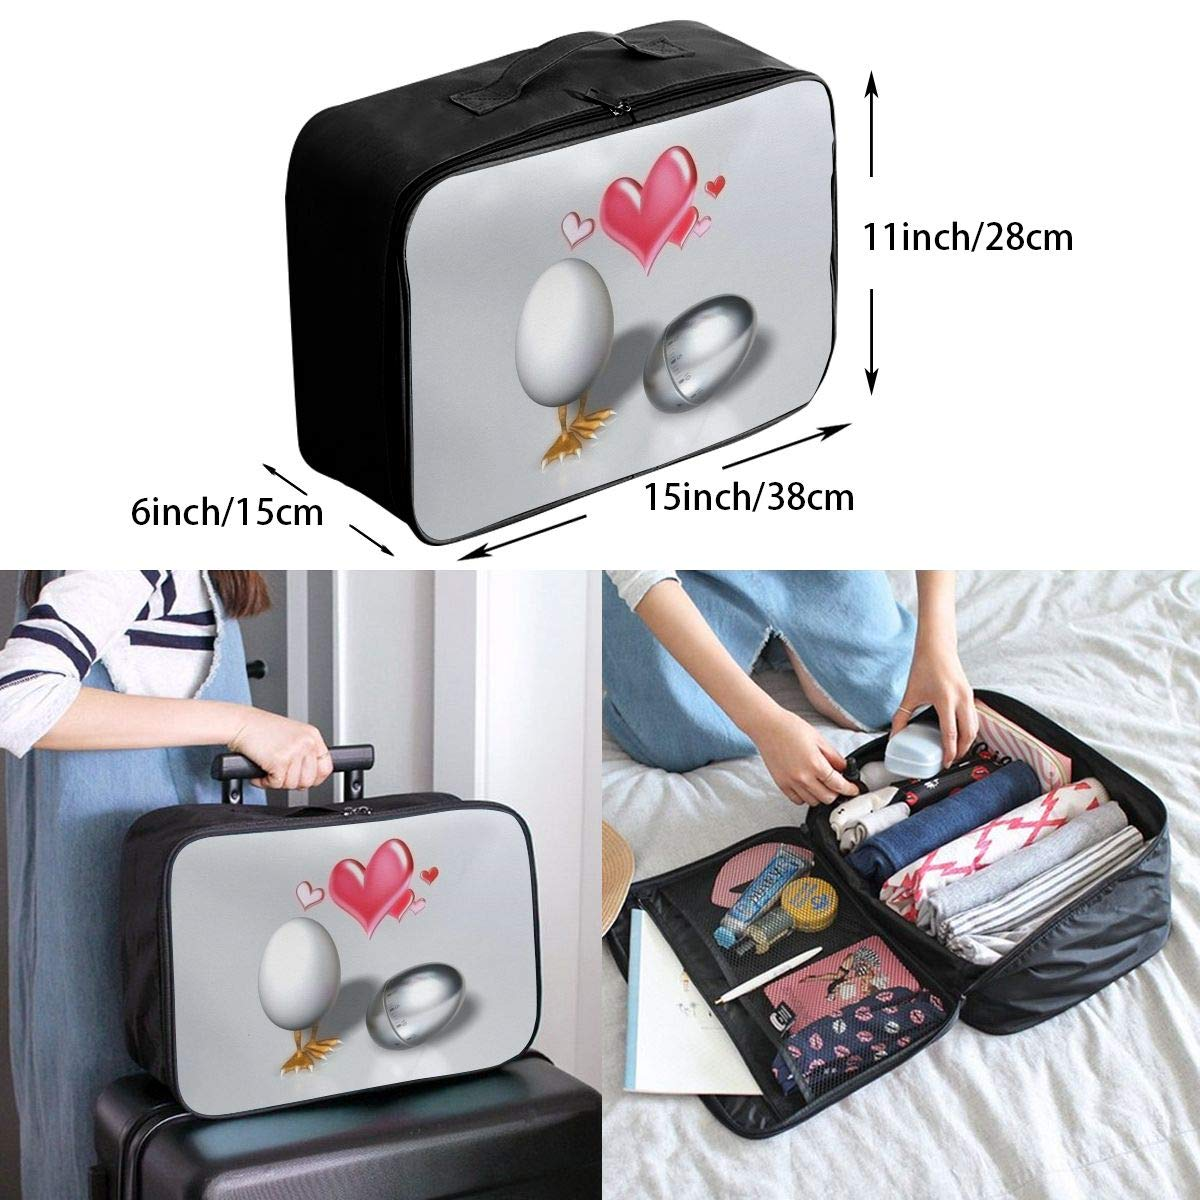 Travel Luggage Duffle Bag Lightweight Portable Handbag Chicken Egg Large Capacity Waterproof Foldable Storage Tote